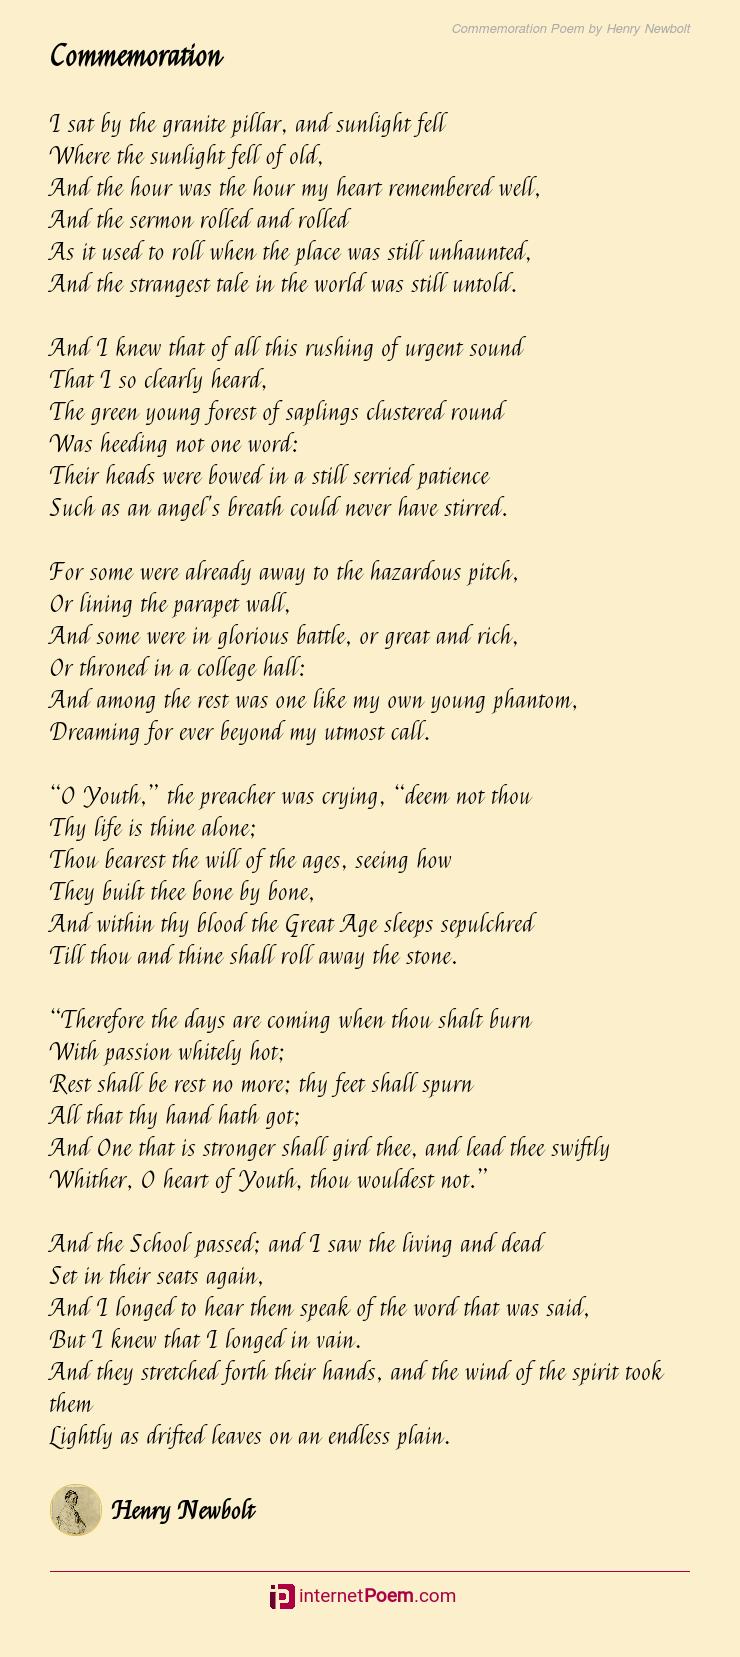 Commemoration Poem By Henry Newbolt